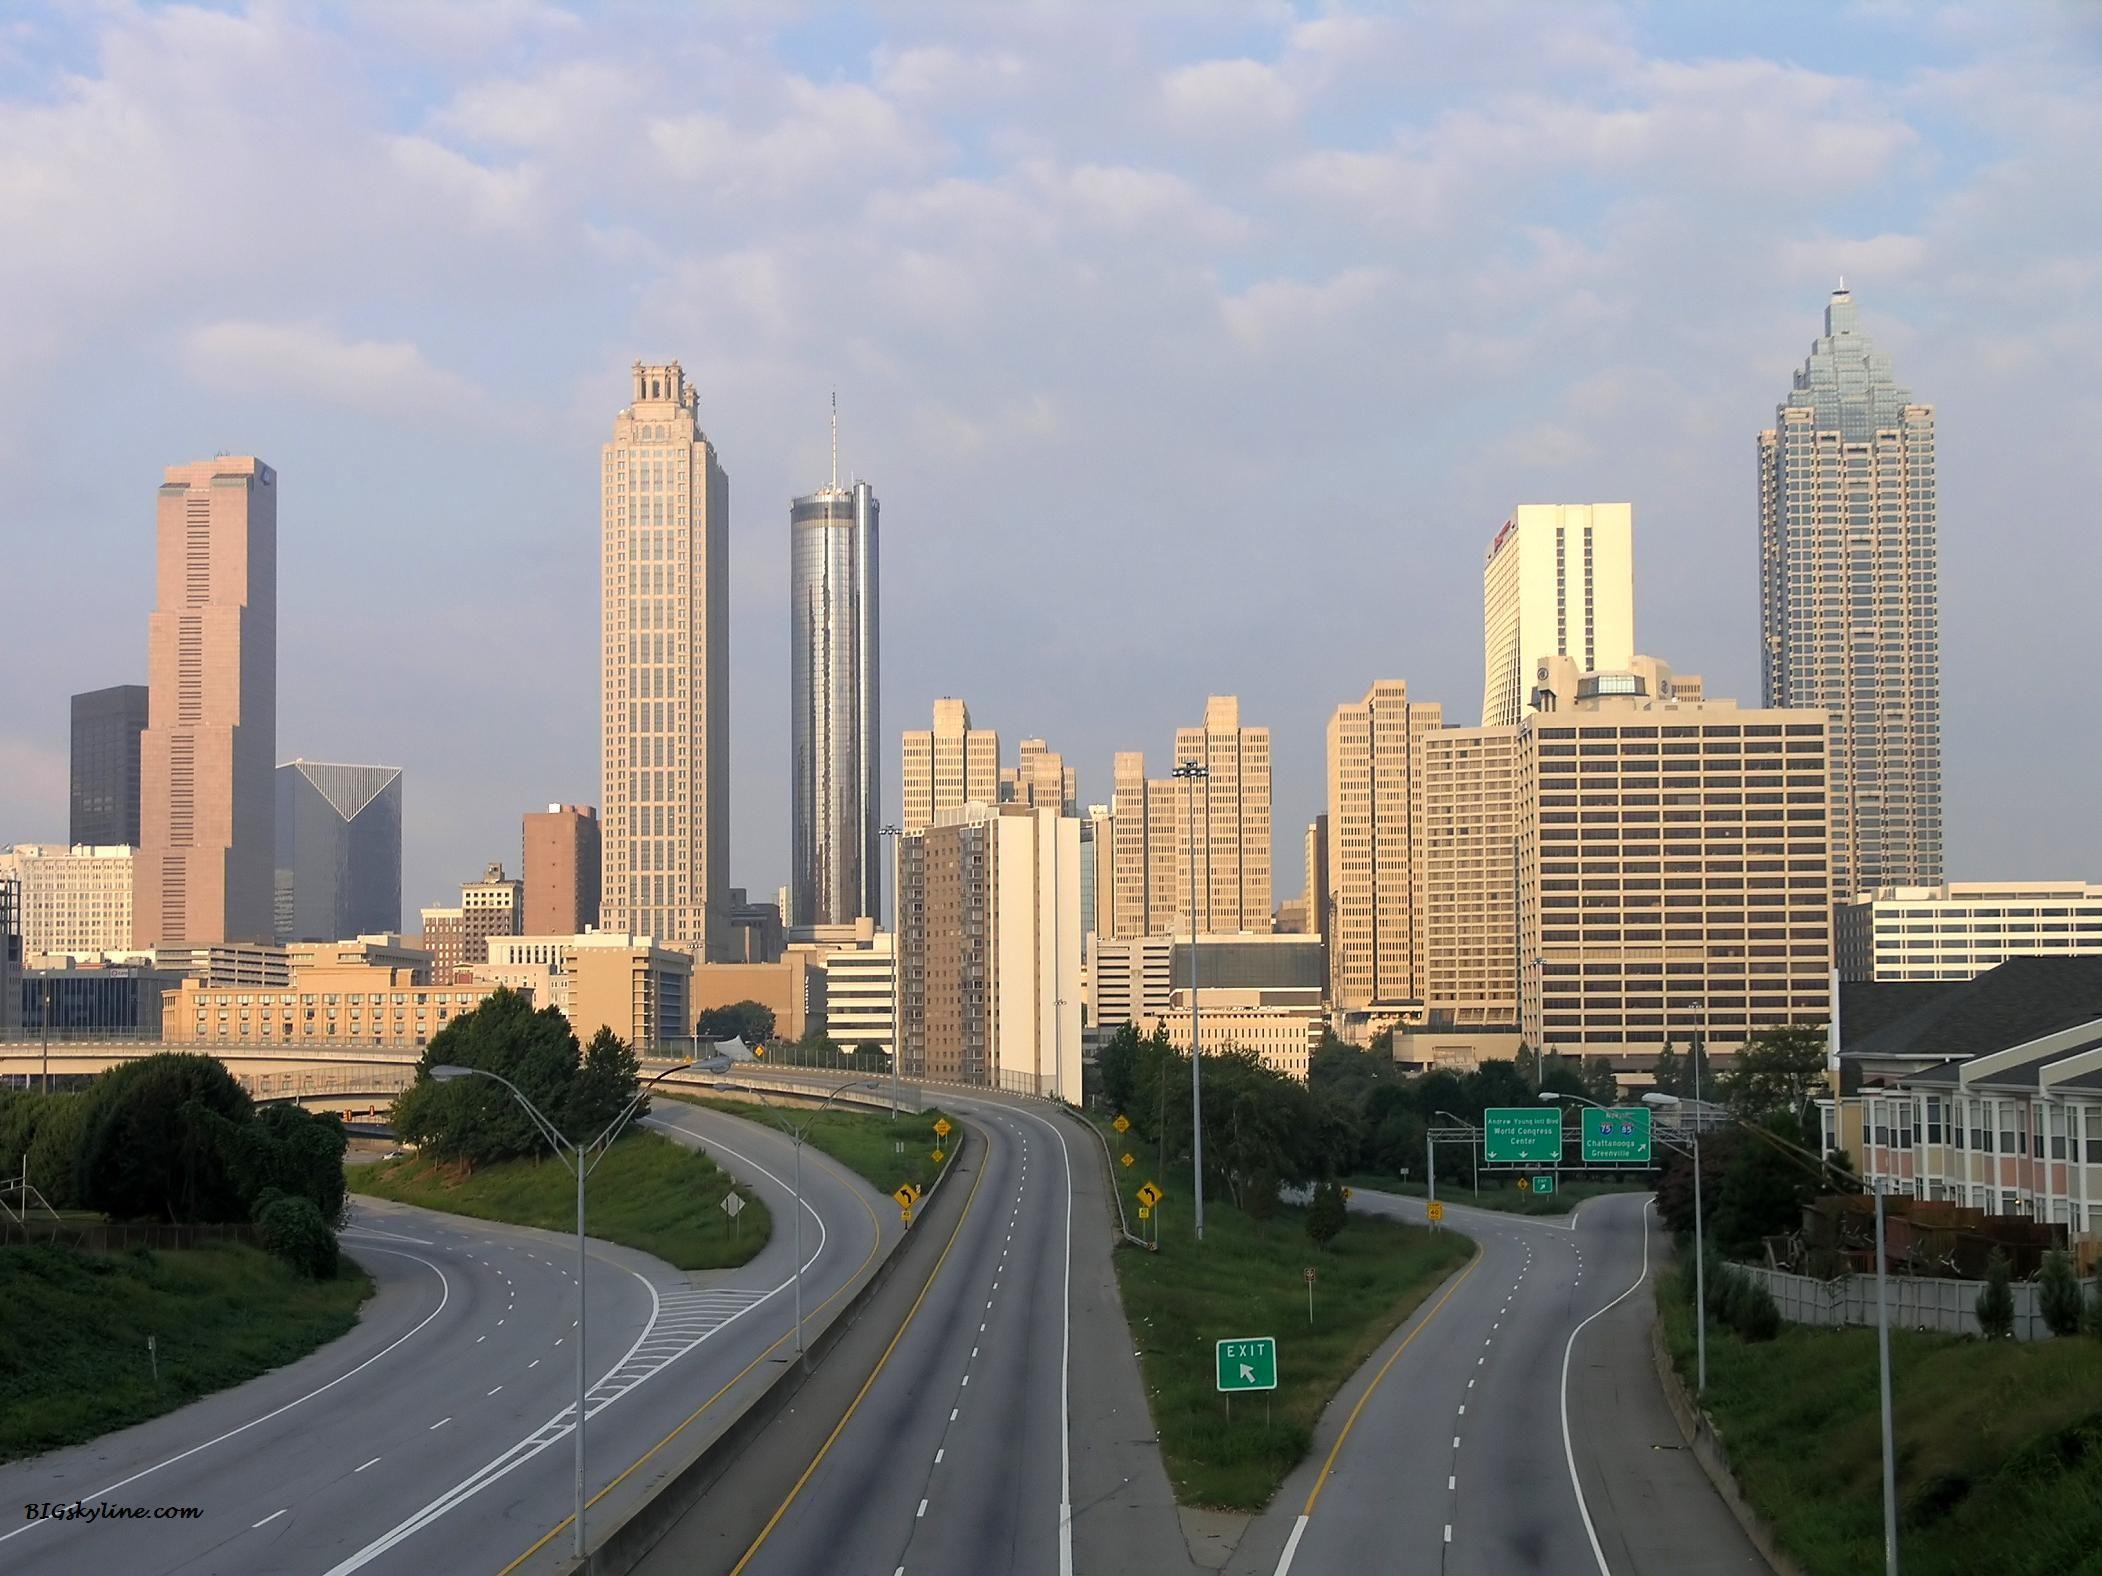 Atlanta Skyline In Georgia United States Of America American - Is georgia in the united states